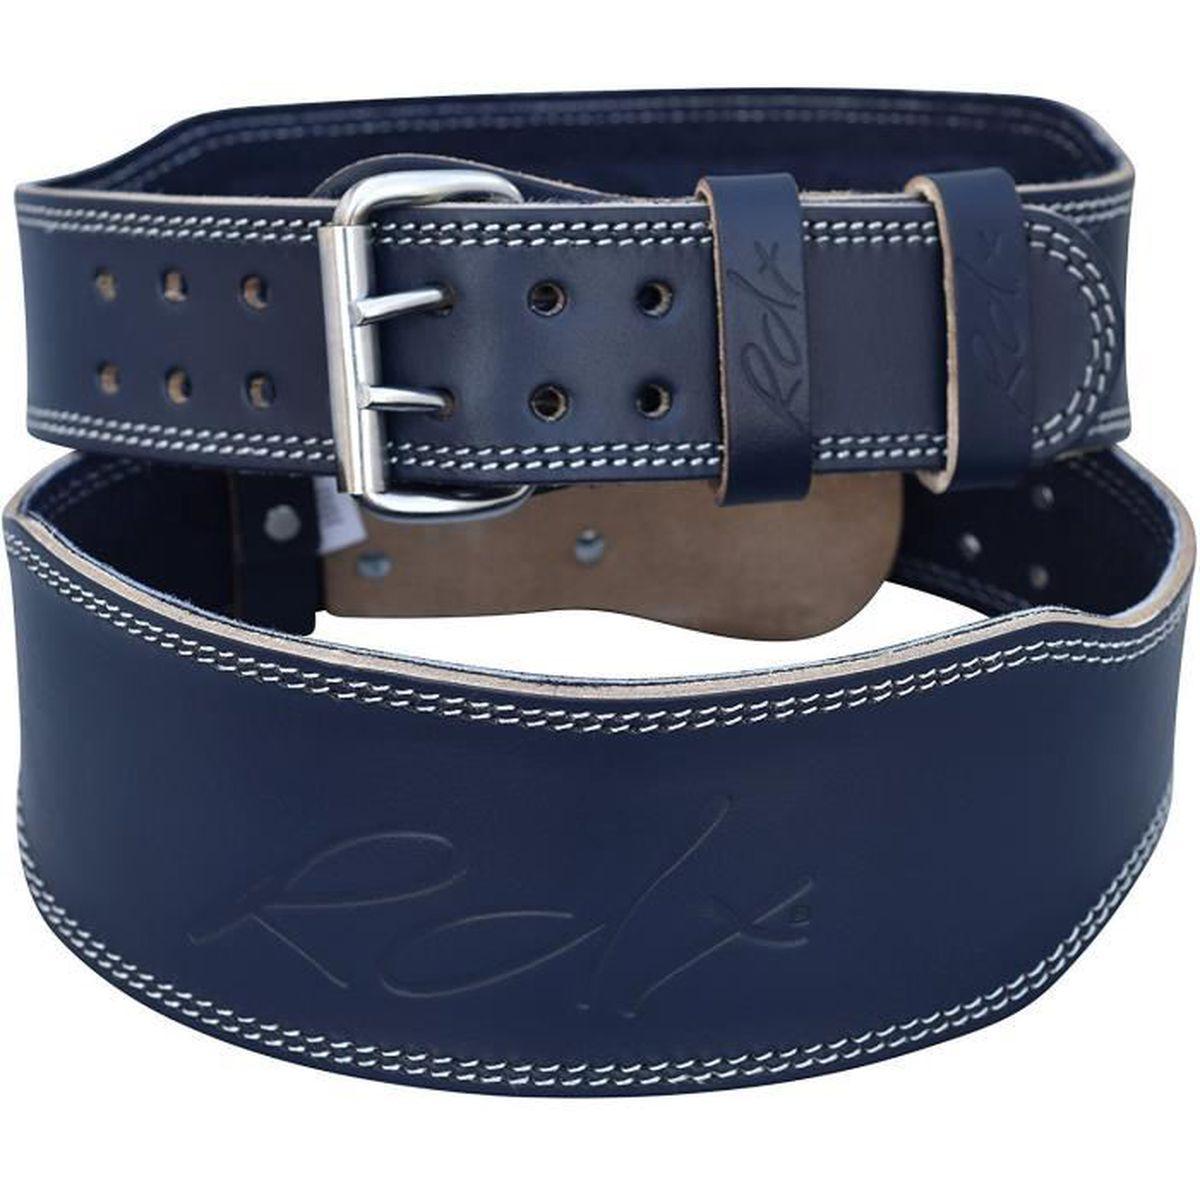 "RDX Poids Levage 4 /""nubuck cuir ceinture support dos sangle sport formation puissance"